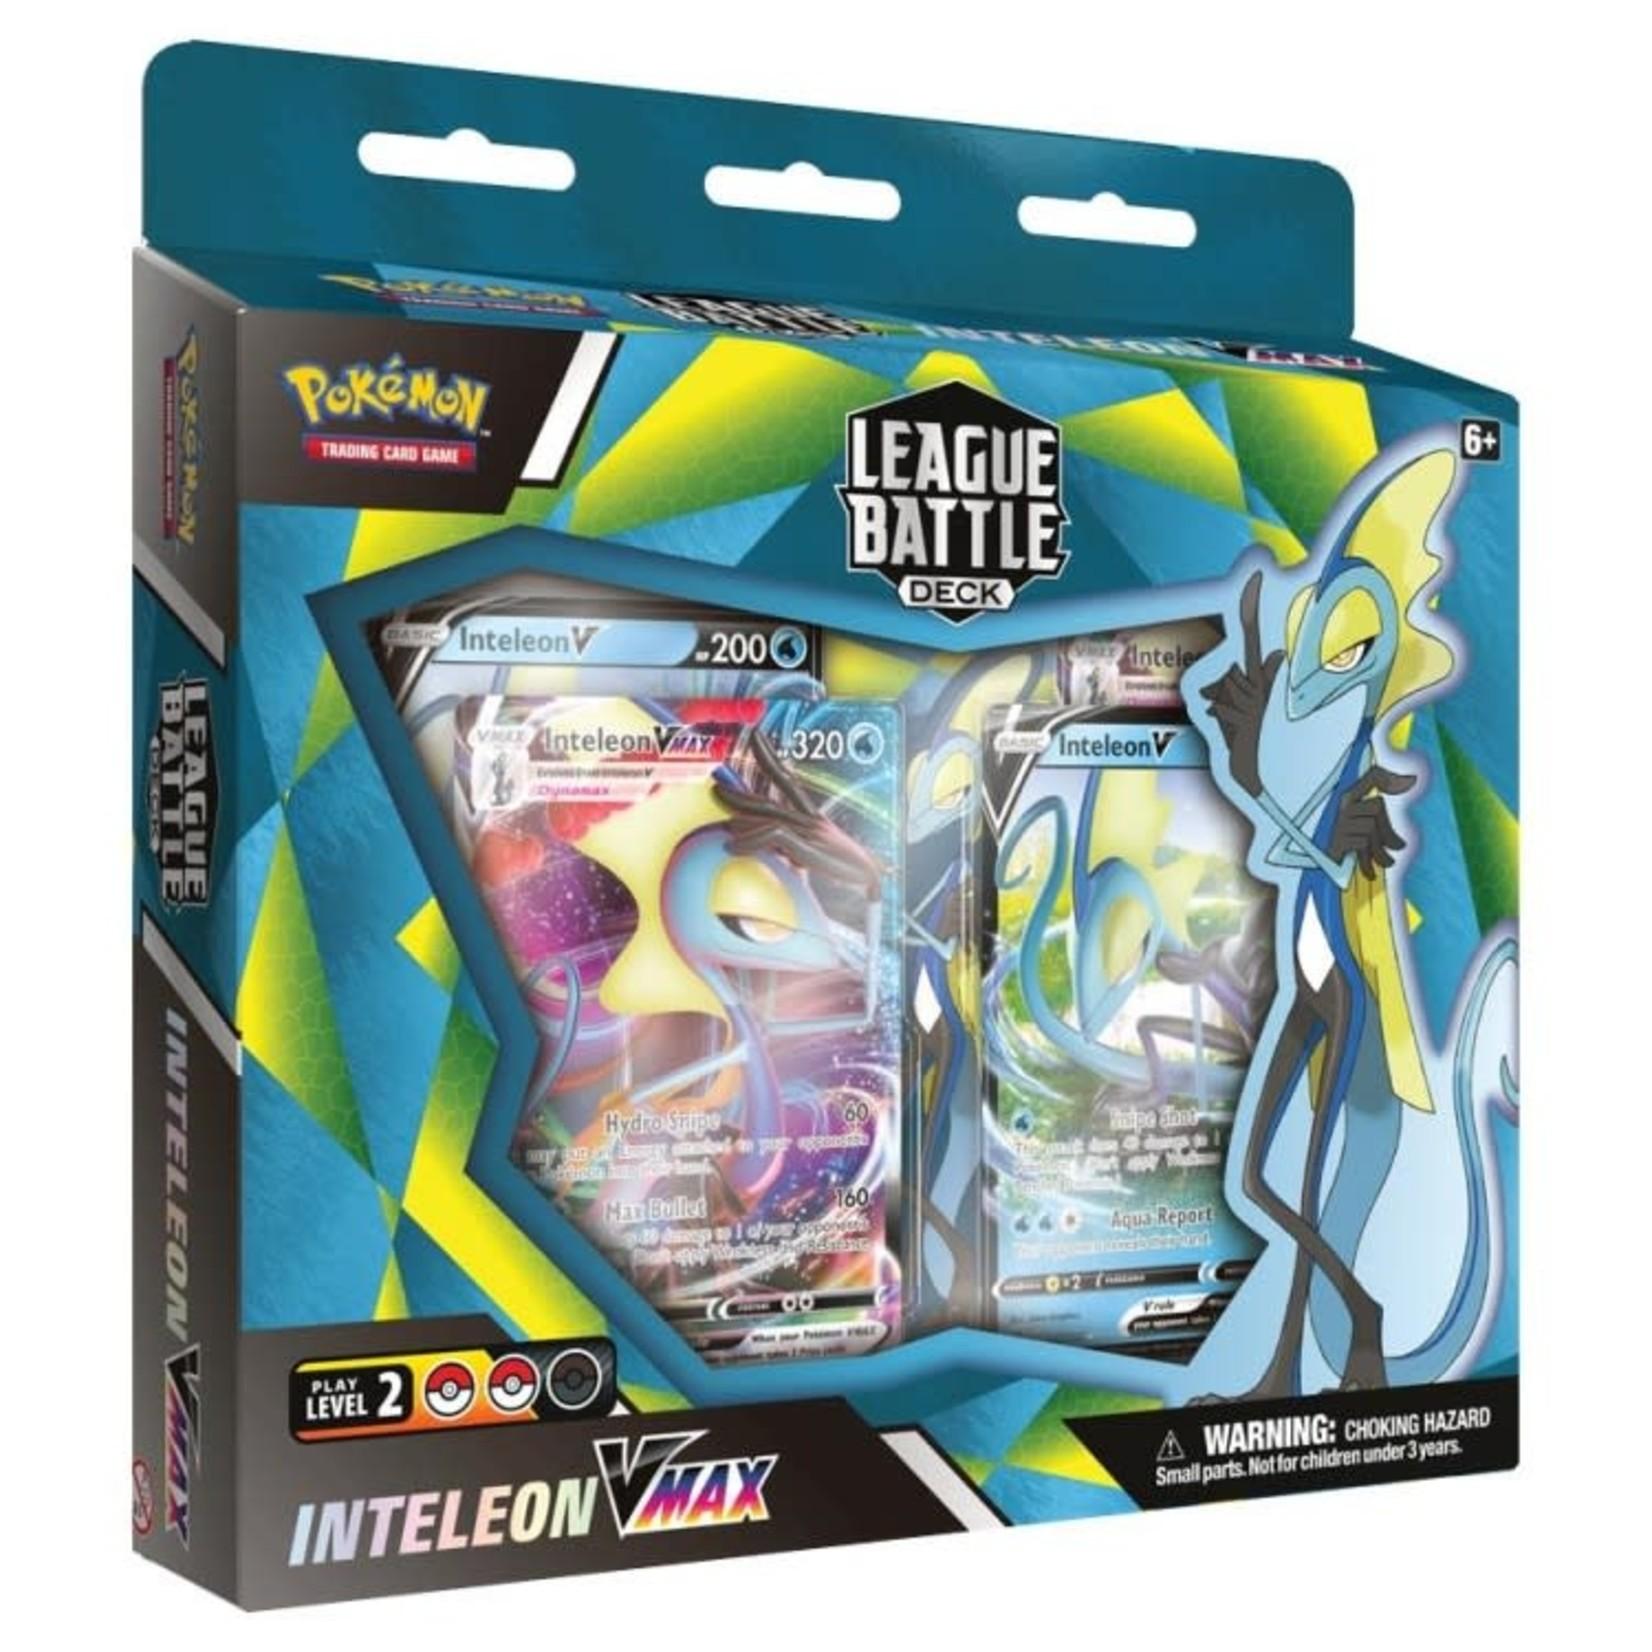 Pokemon International Pokemon League Battle Deck : Inteleon VMAX